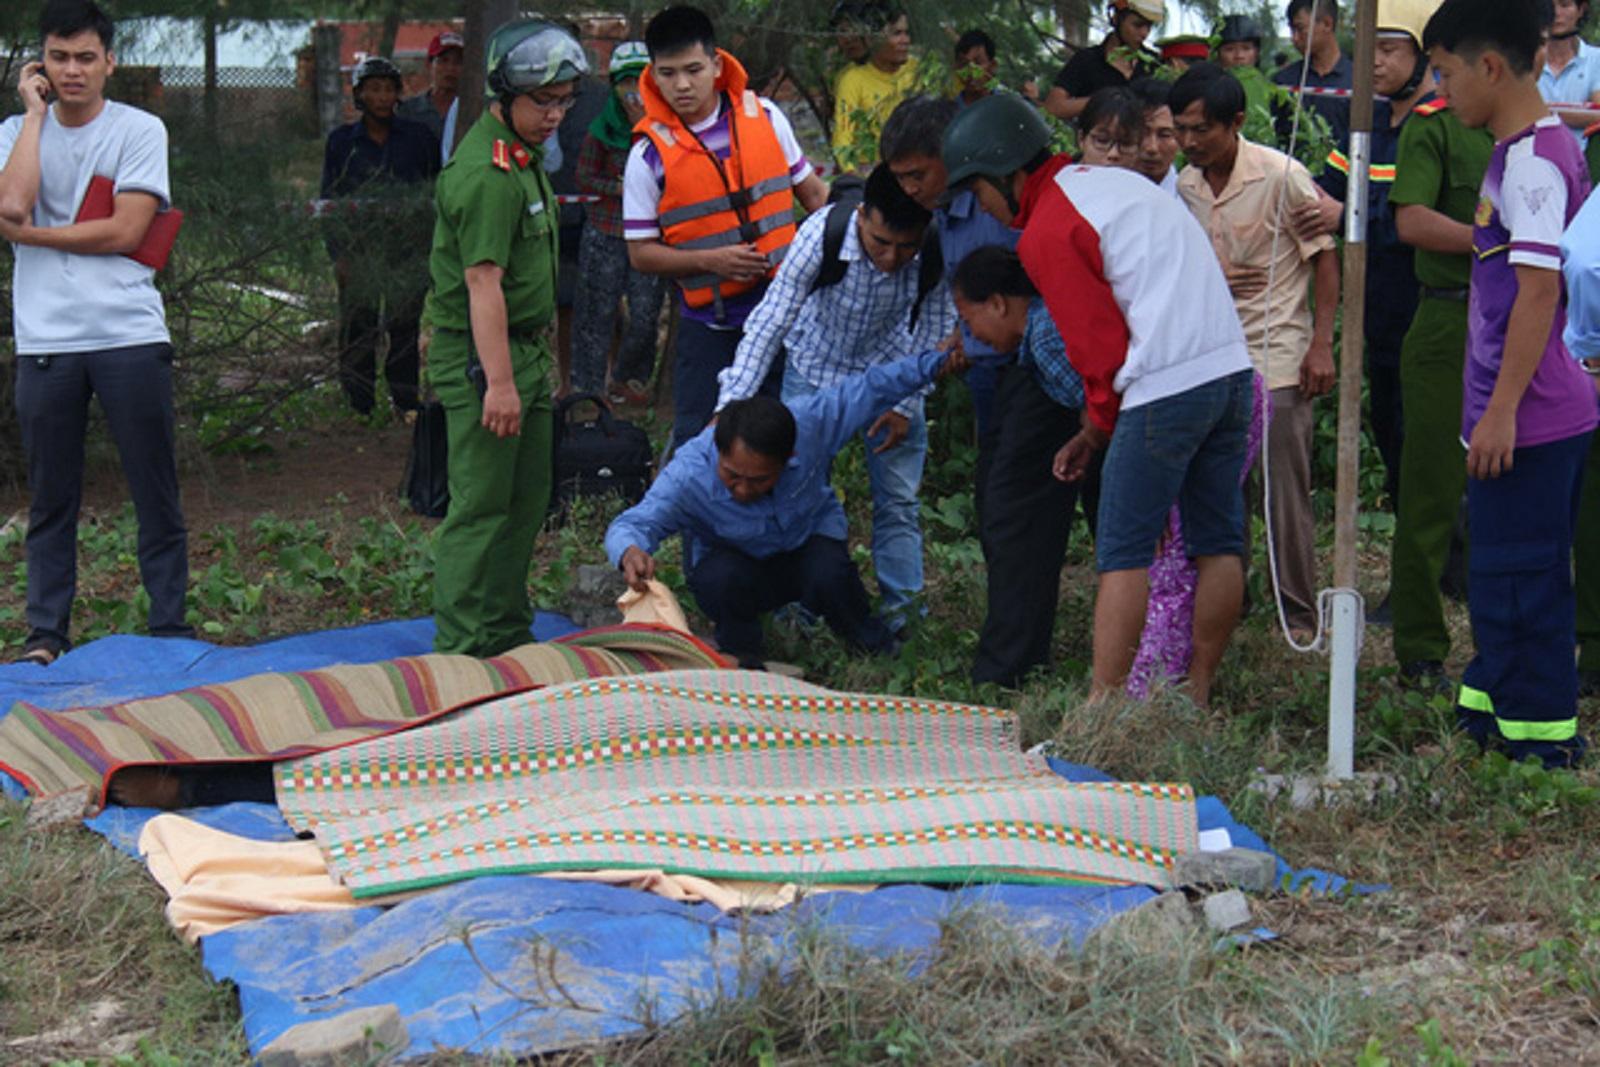 Gia Lai: Hai học sinh tử vong do đuối nước